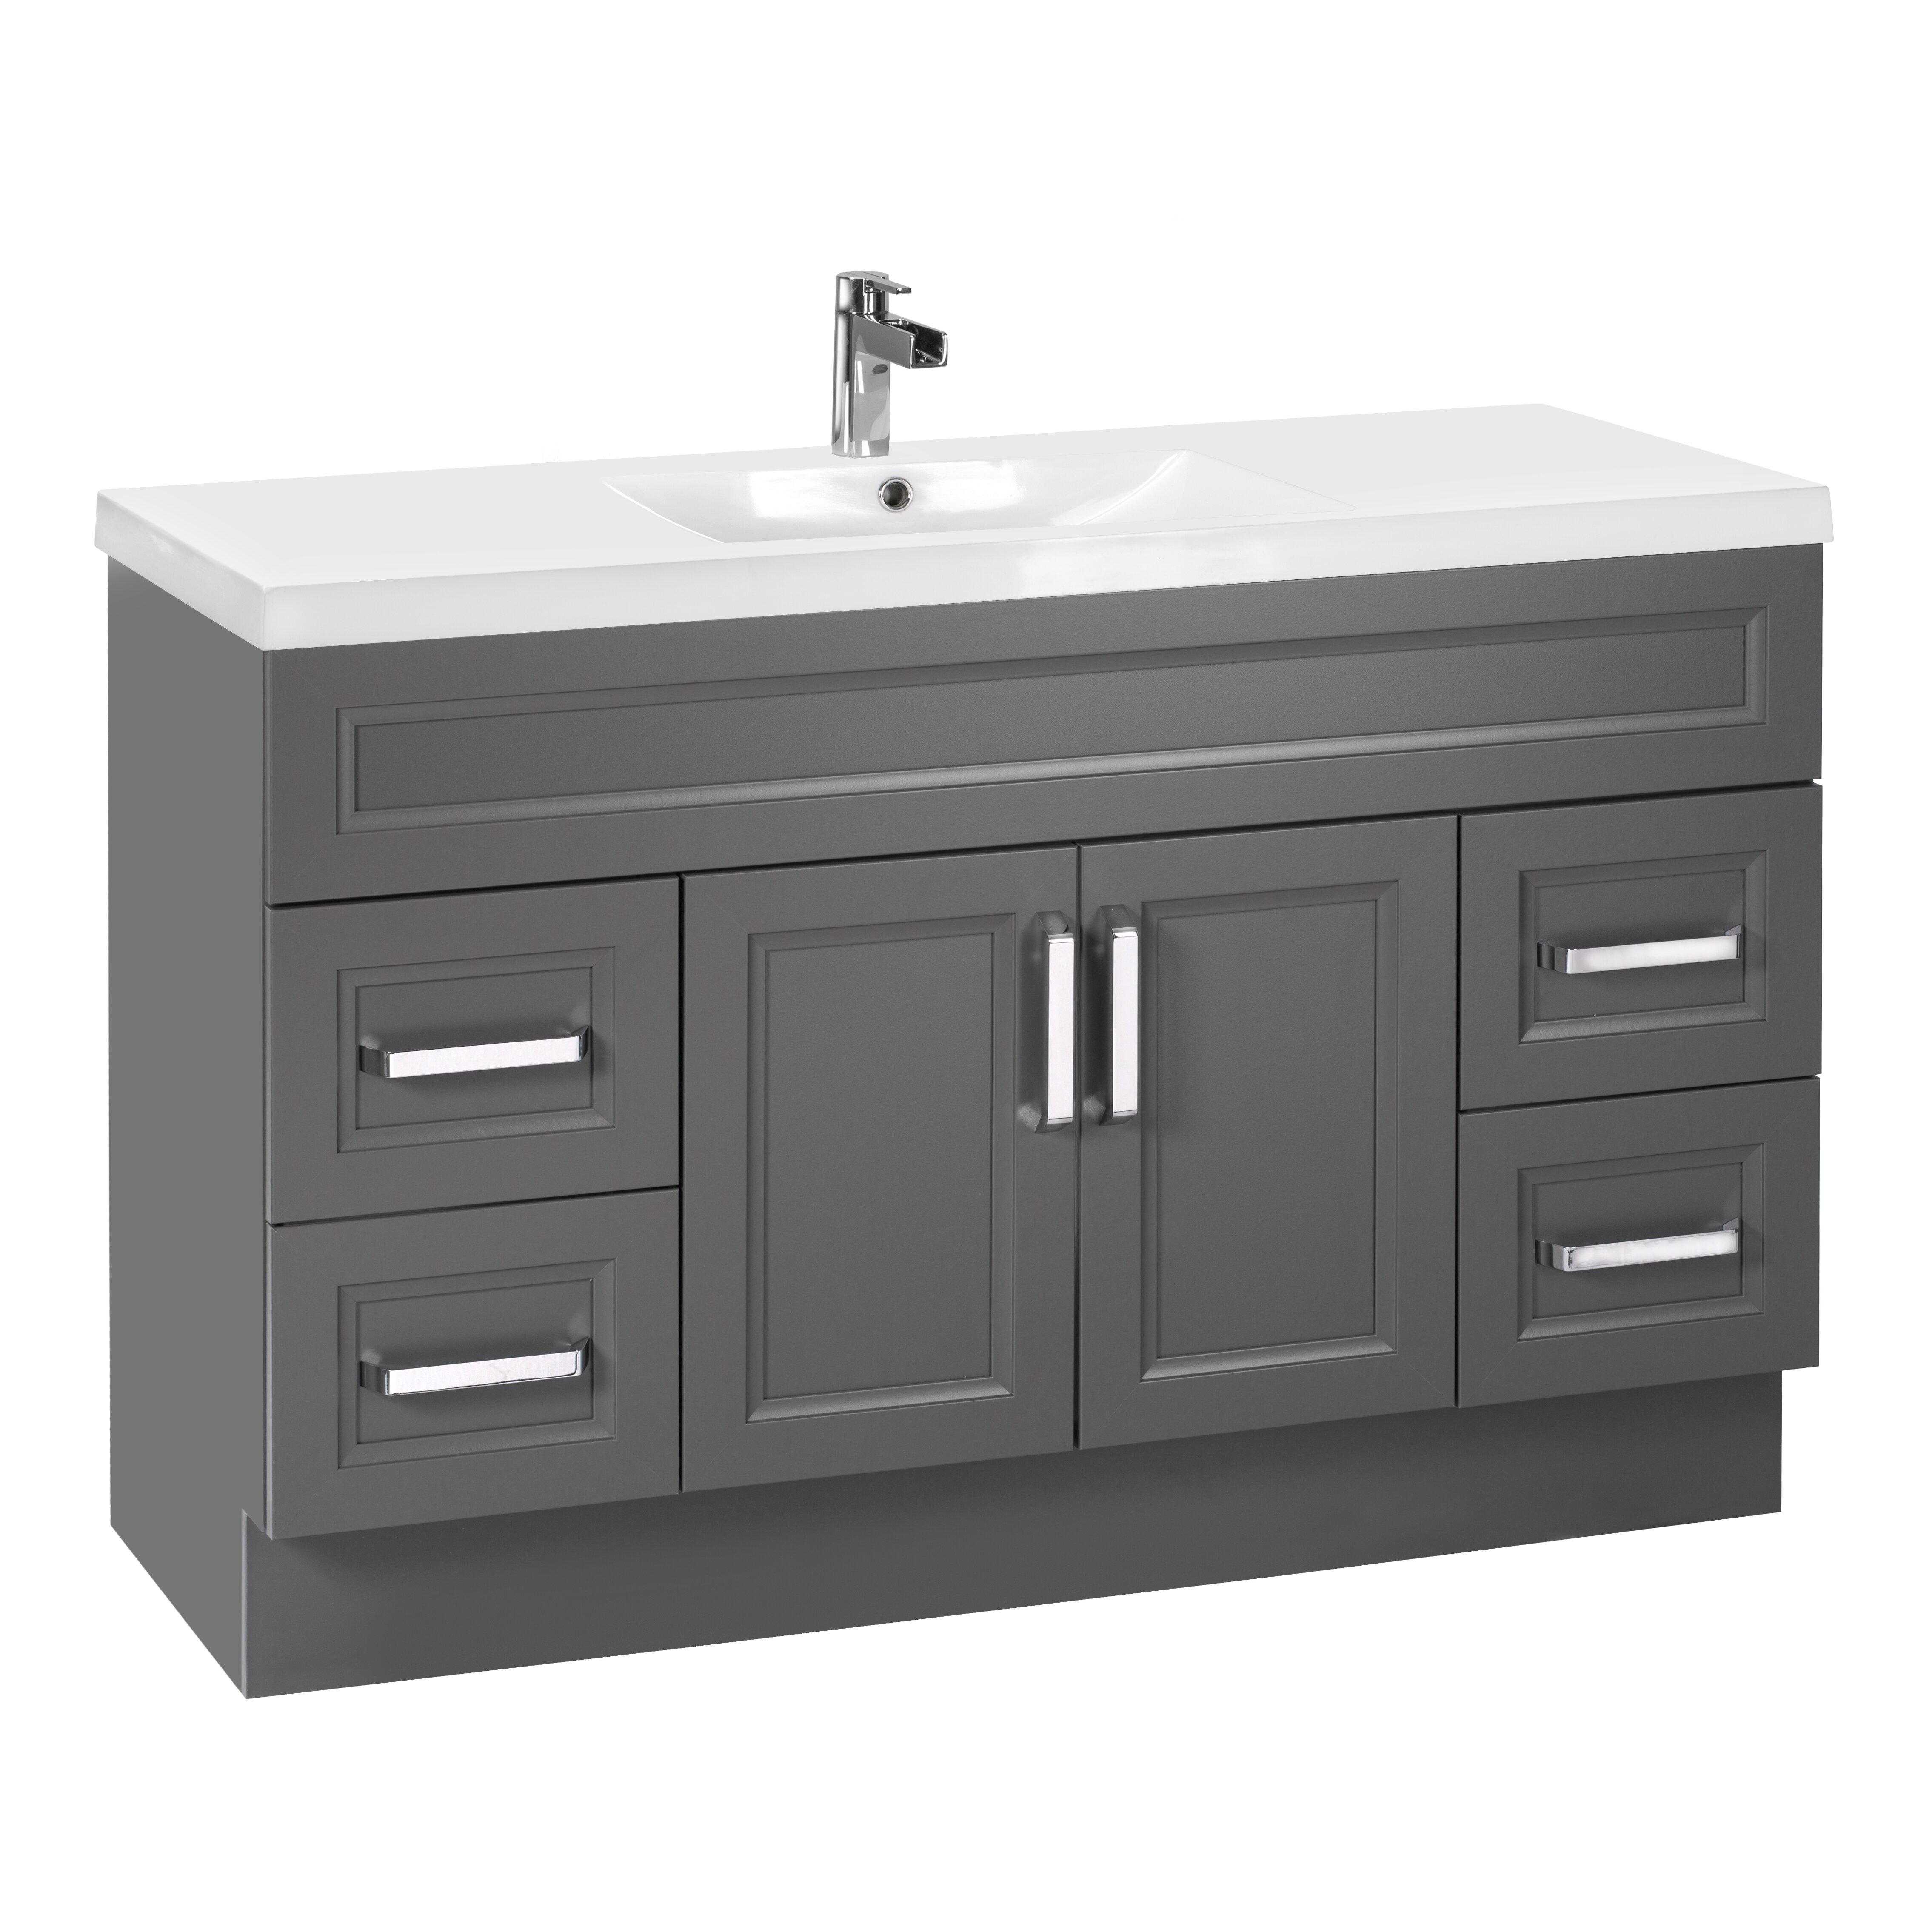 "Cutler Kitchen & Bath Urban 48"" Vanity Single Bowl ..."